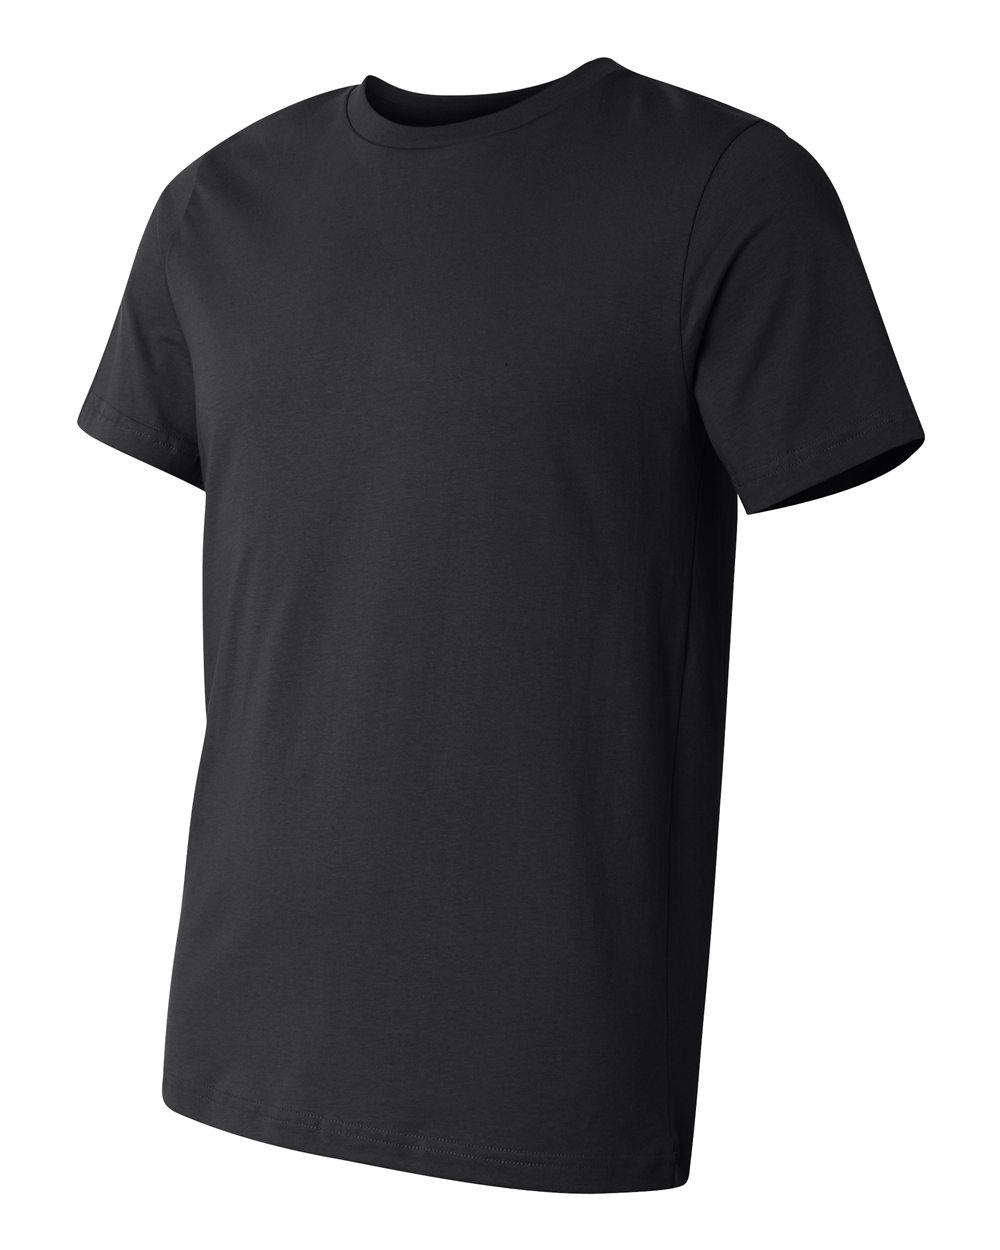 Bella-Canvas-Unisex-Made-in-USA-Jersey-Short-Sleeve-T-Shirt-3001U-XS-3XL thumbnail 15